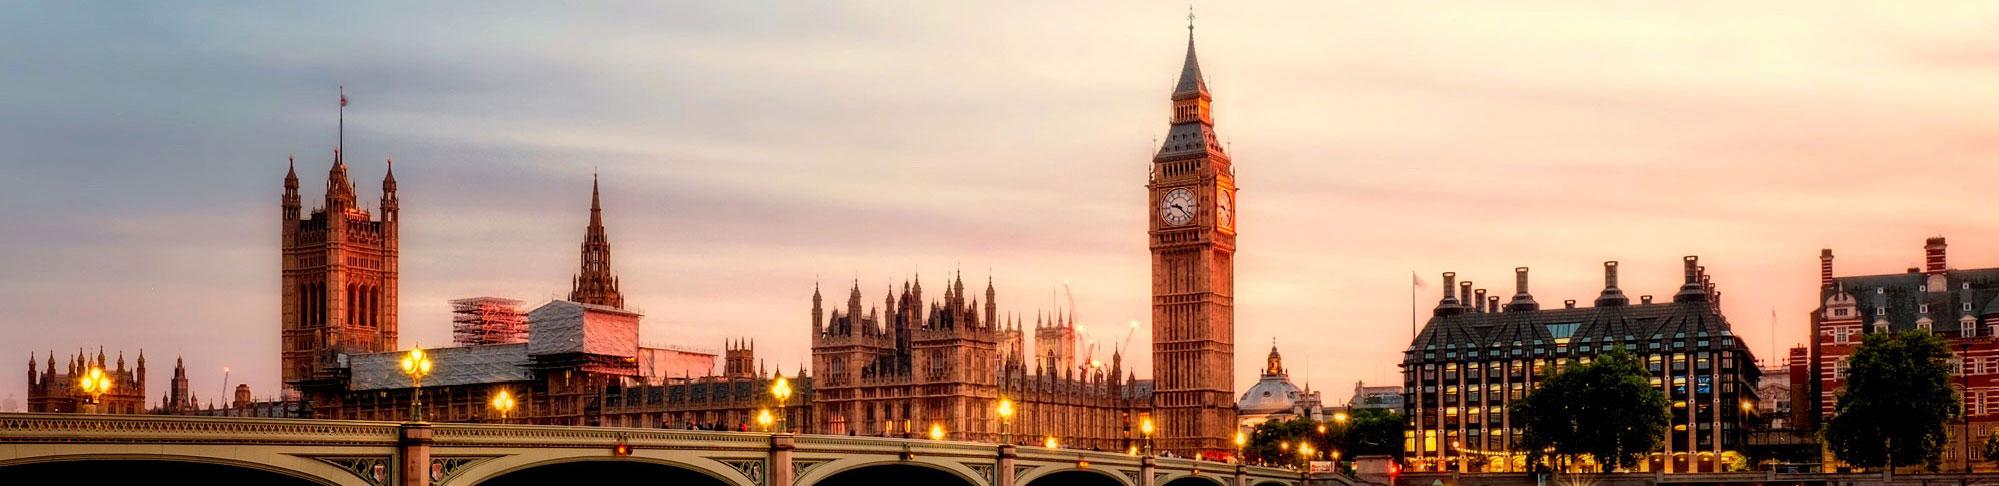 London's skyline at sunset